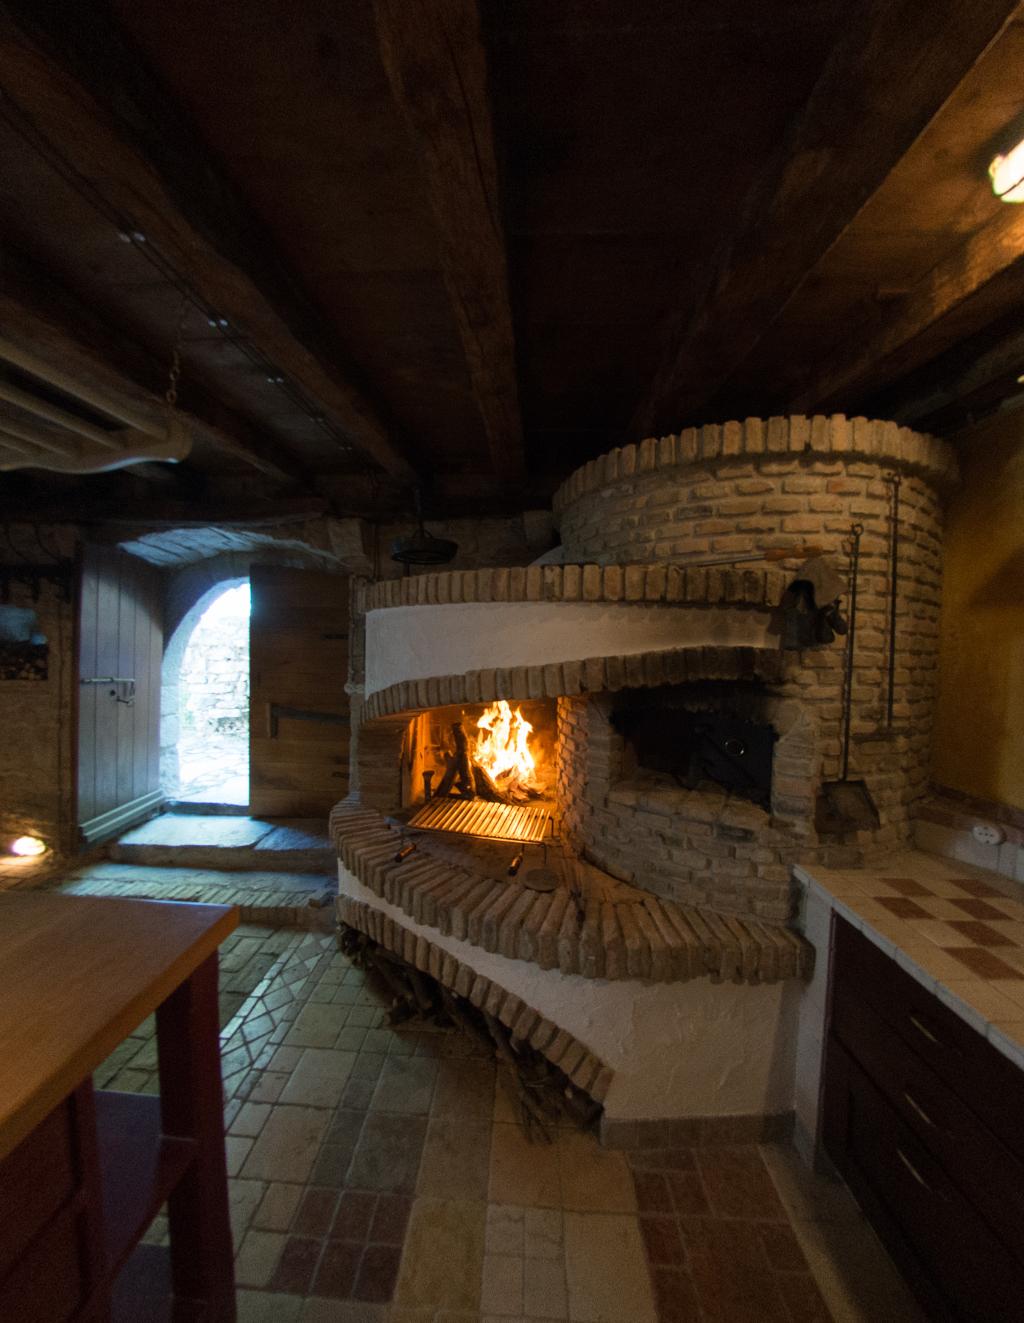 Servizi bonavista brela - Forno pizza casa legna ...